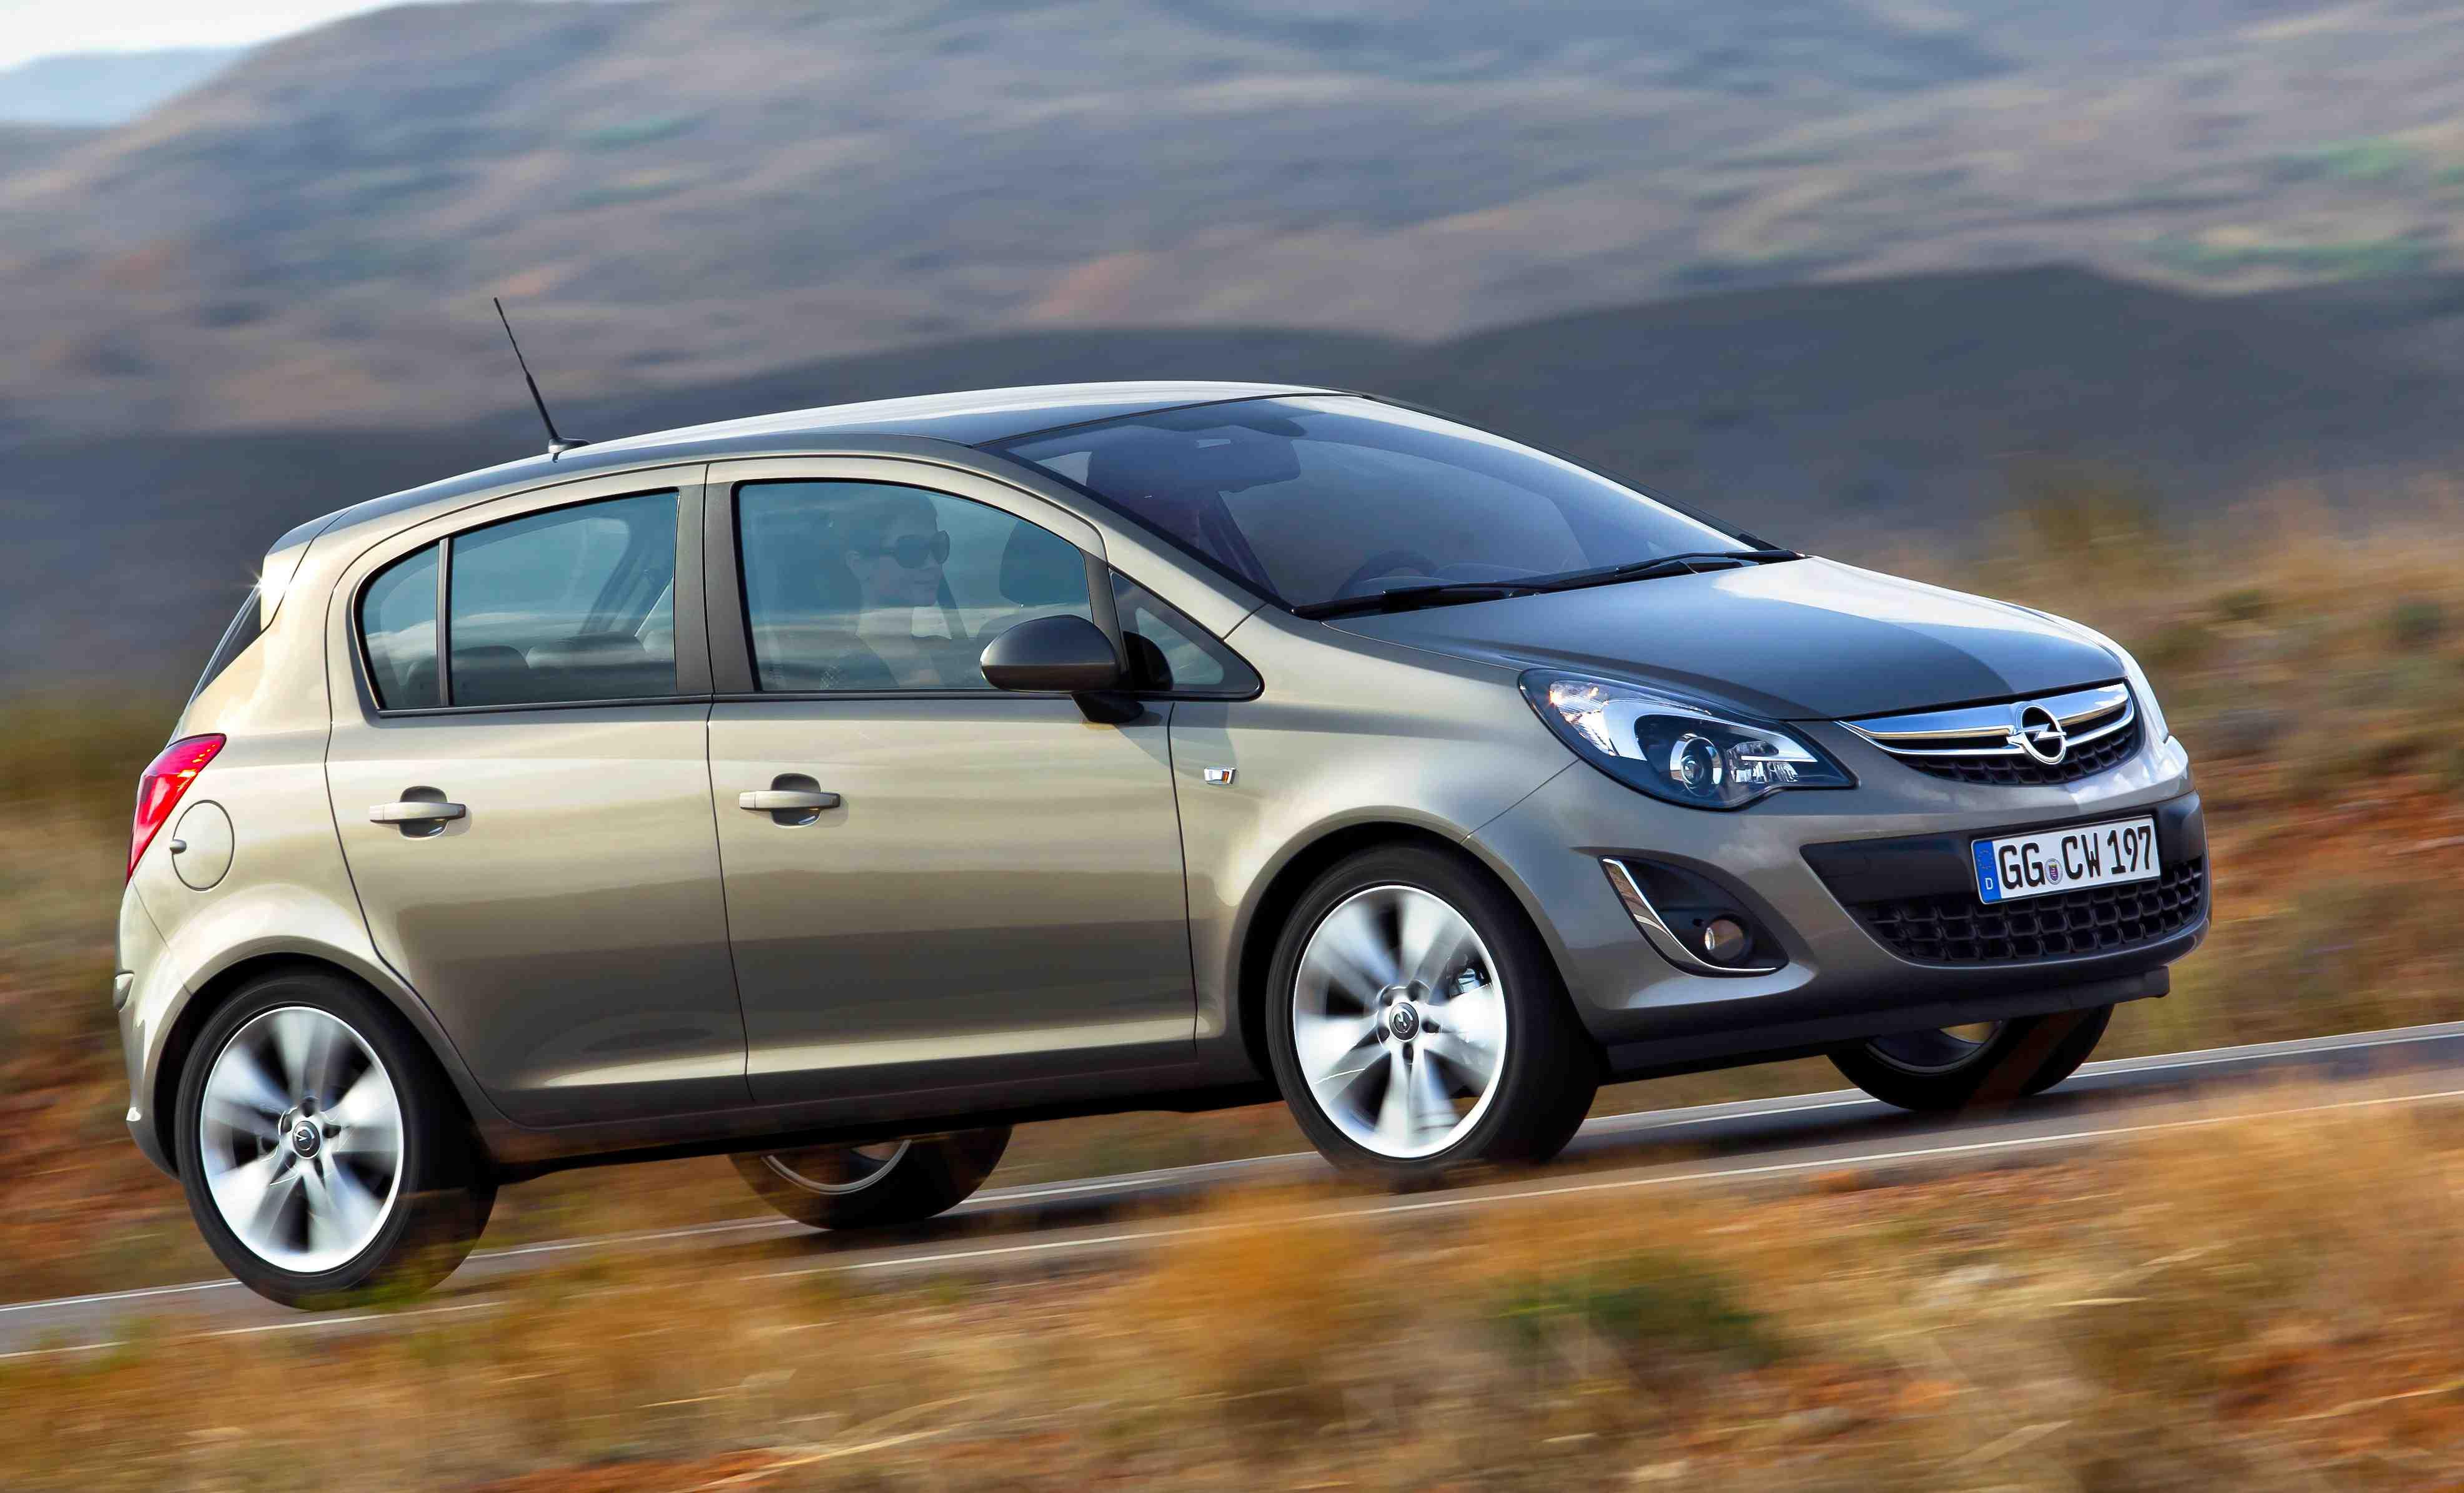 Opel Corsa dyna 1.3 CDTi Ecoflex  autos wallpapers Desktop Download